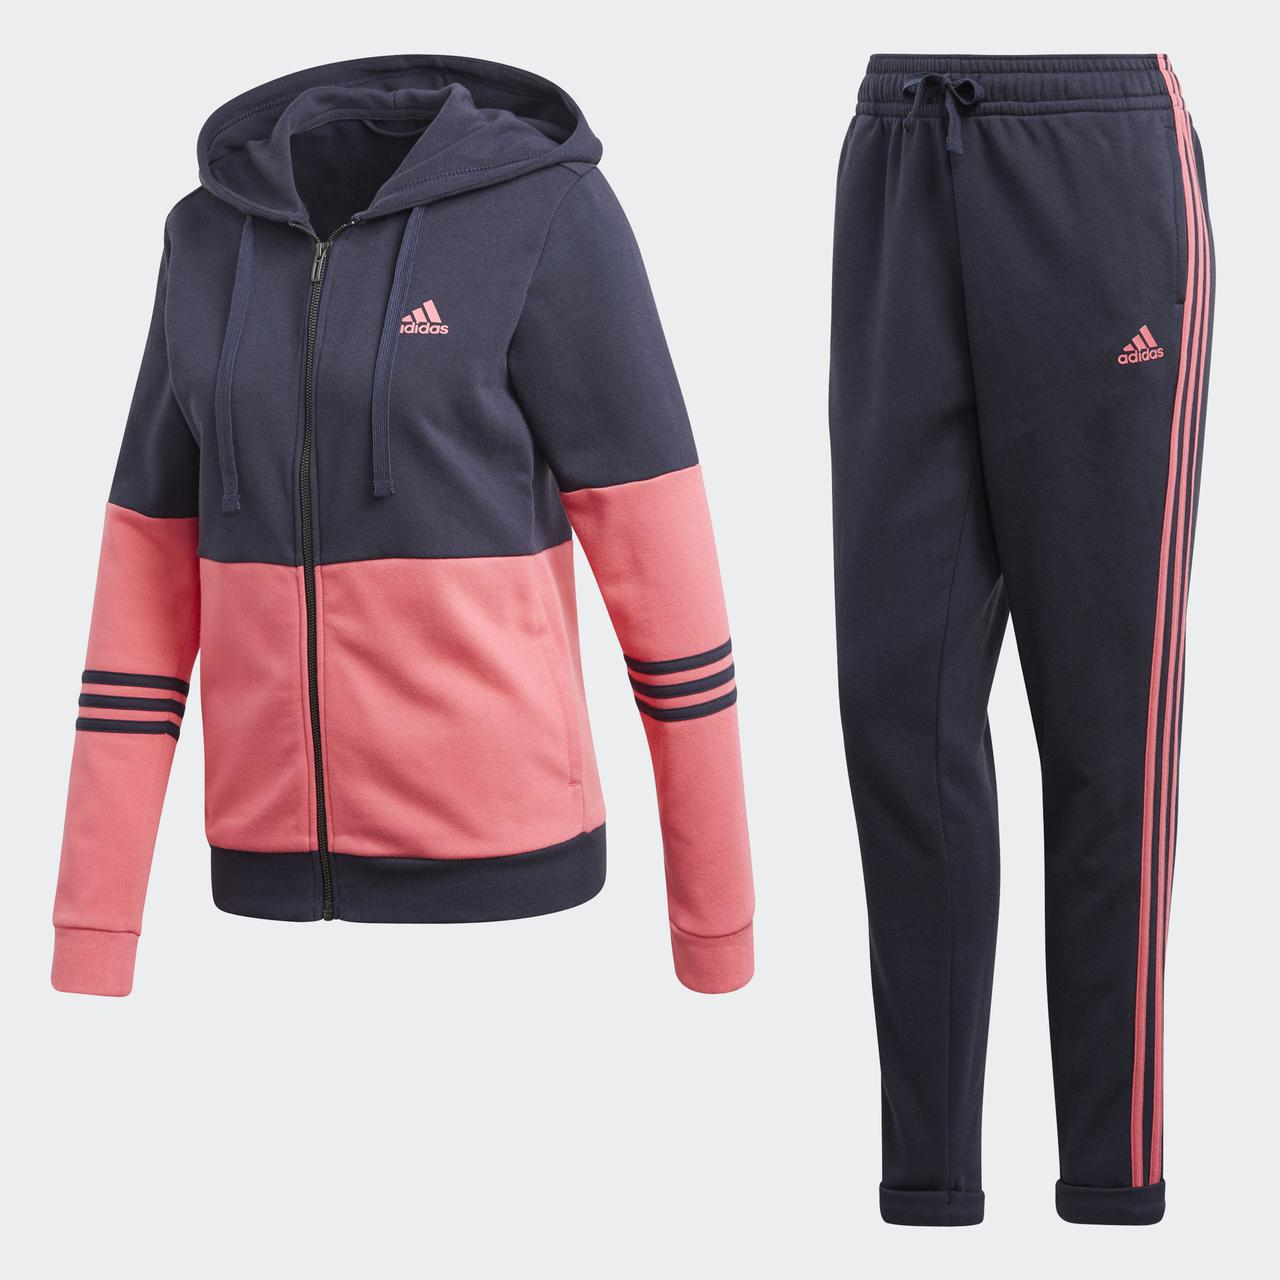 7cba7fde Женский спортивный костюм Adidas Performance Energize (Артикул: CW4181)